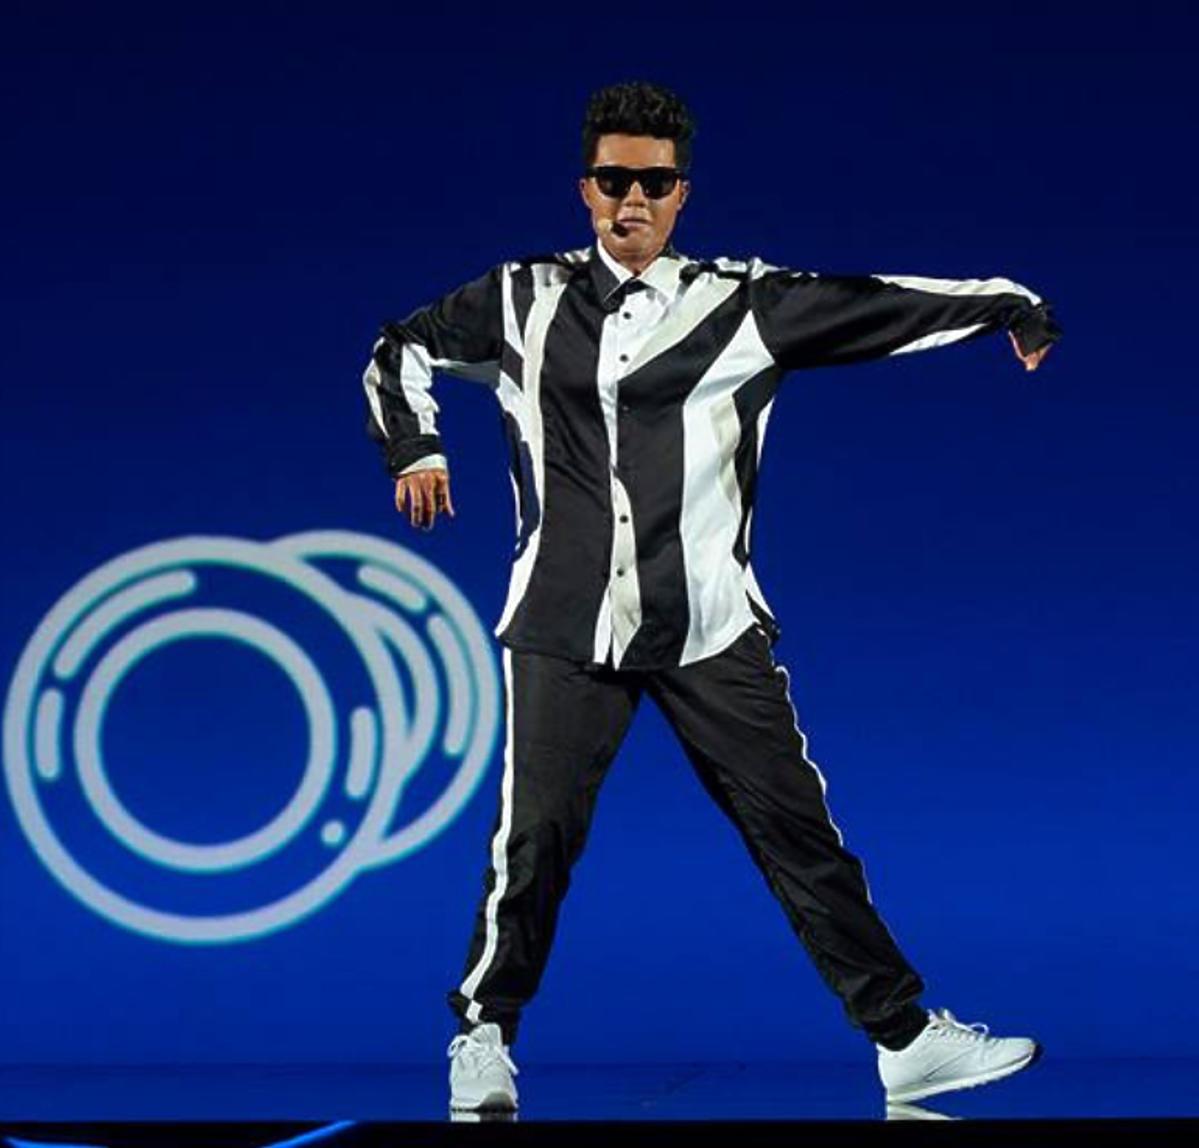 Iga Krefft jako Bruno Mars